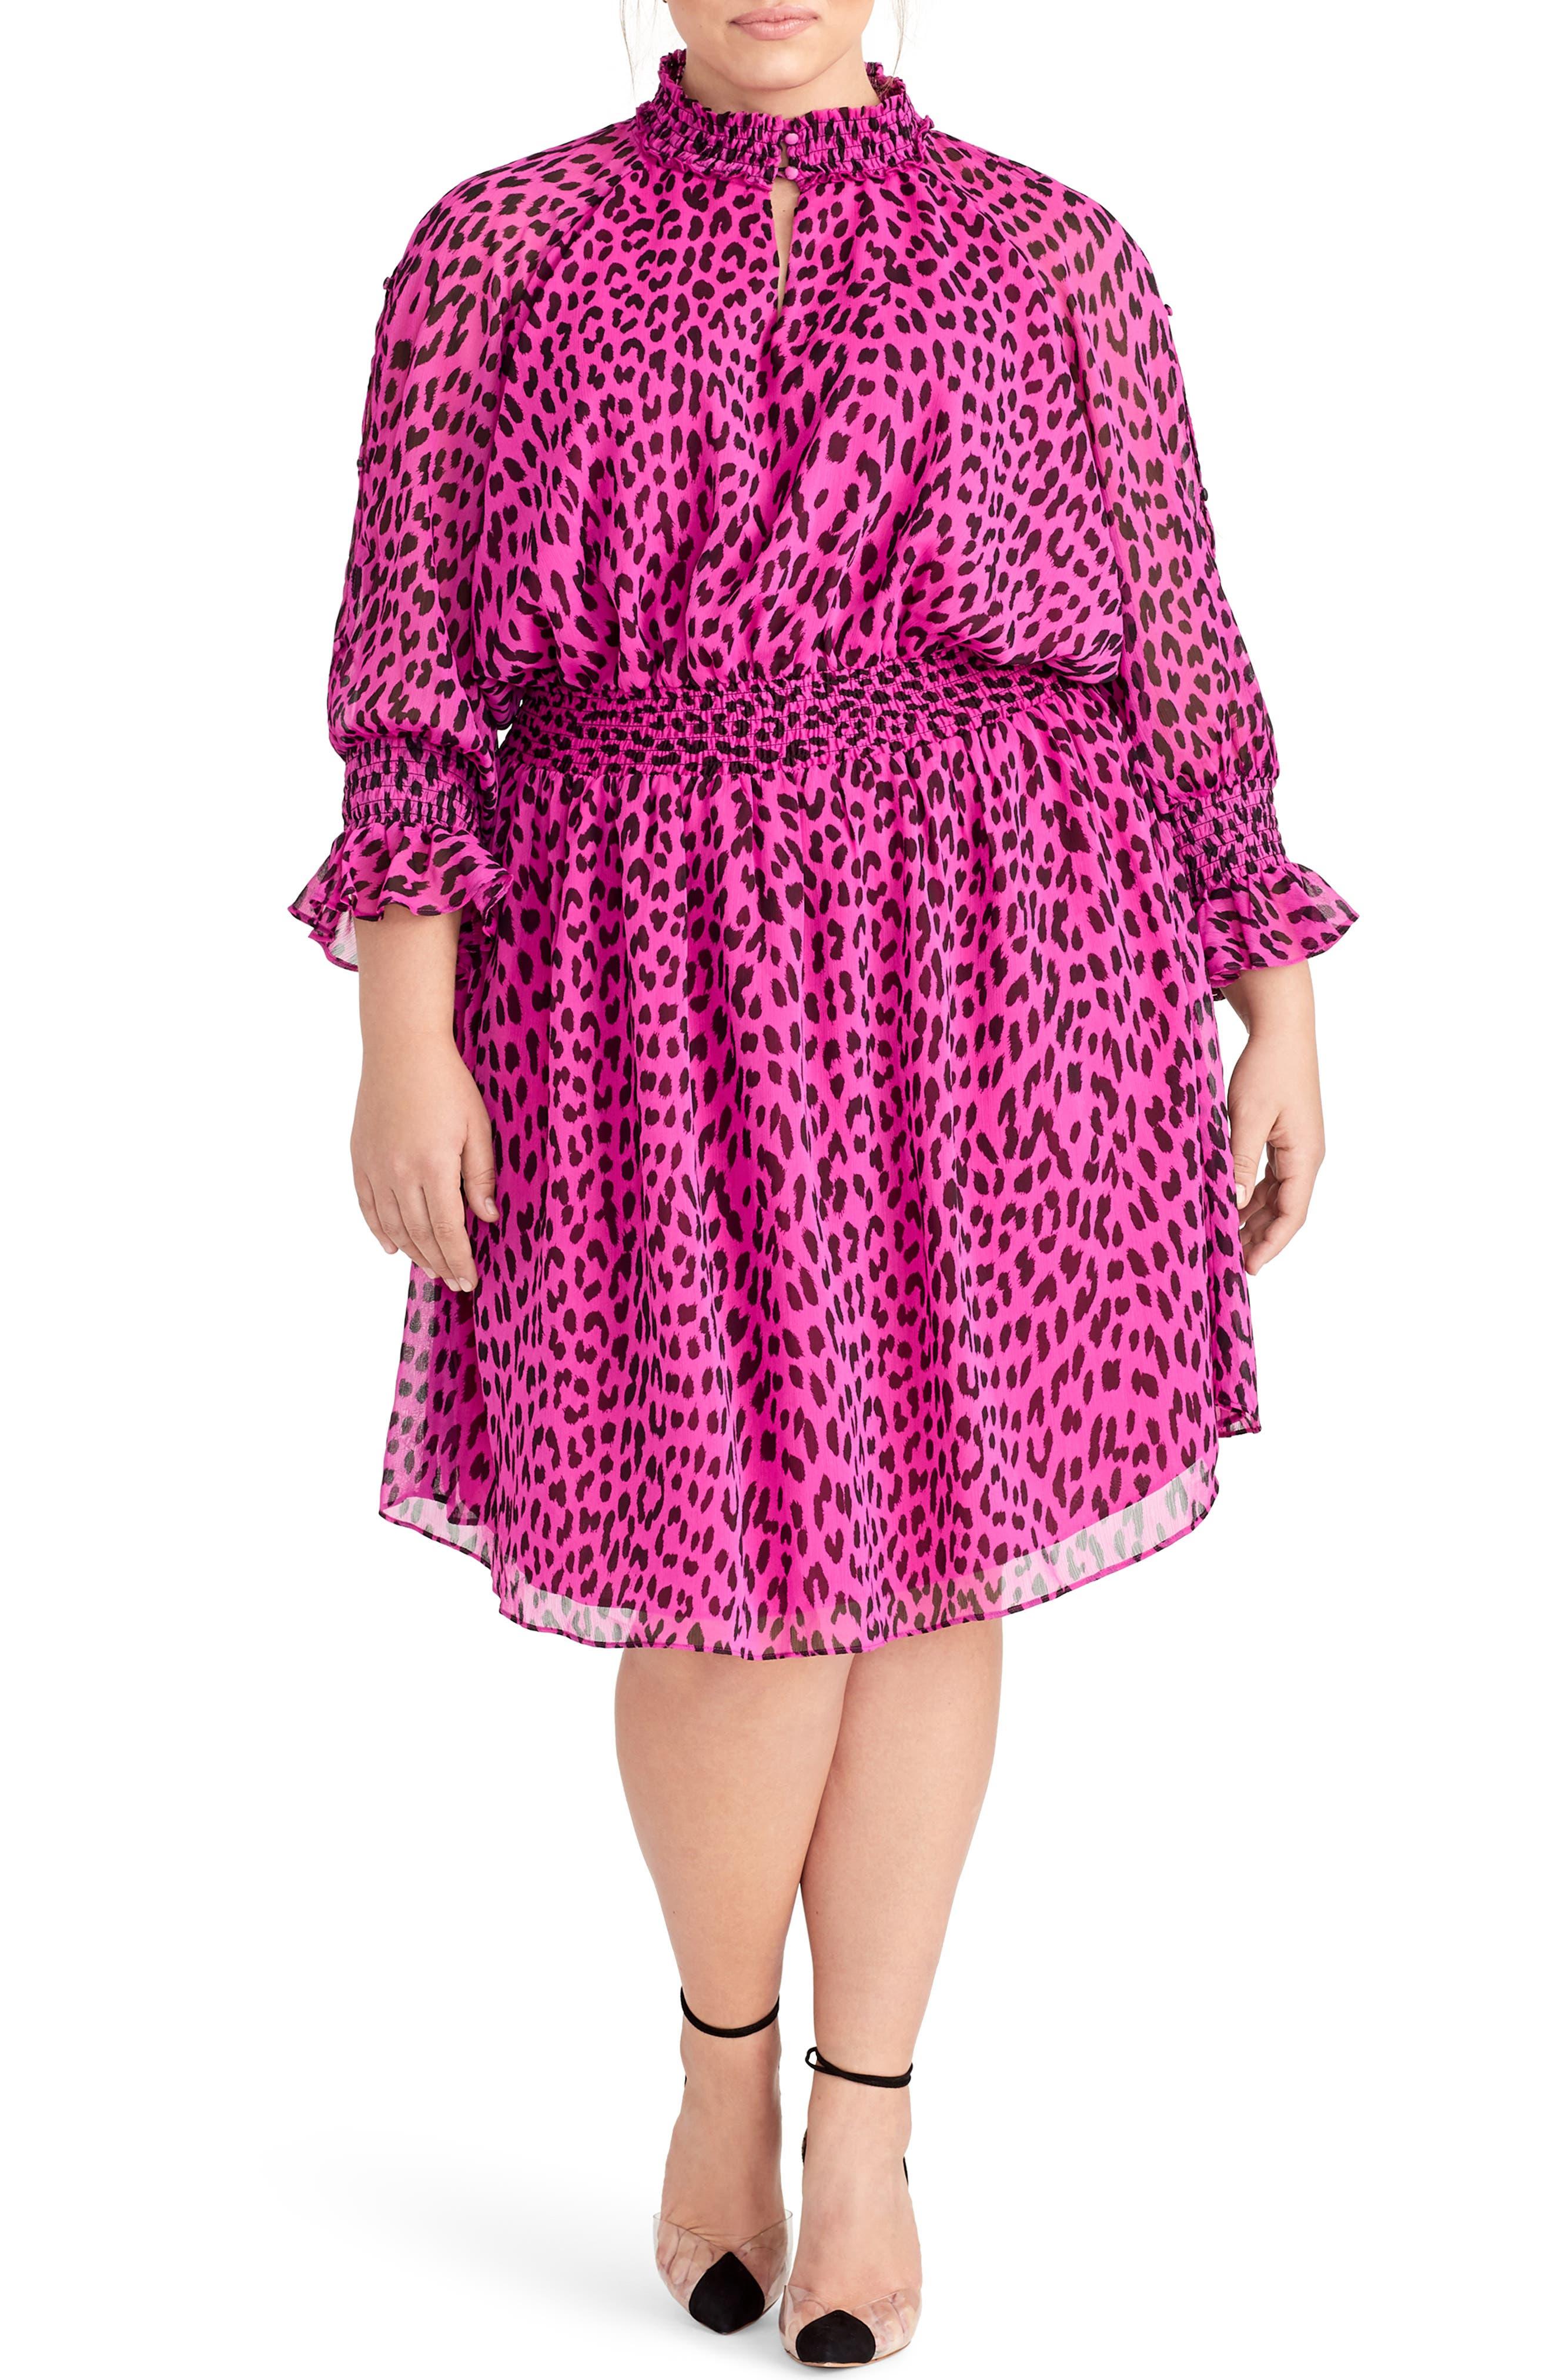 Plus Size Rachel Rachel Roy Lucky Leopard Dress, Pink